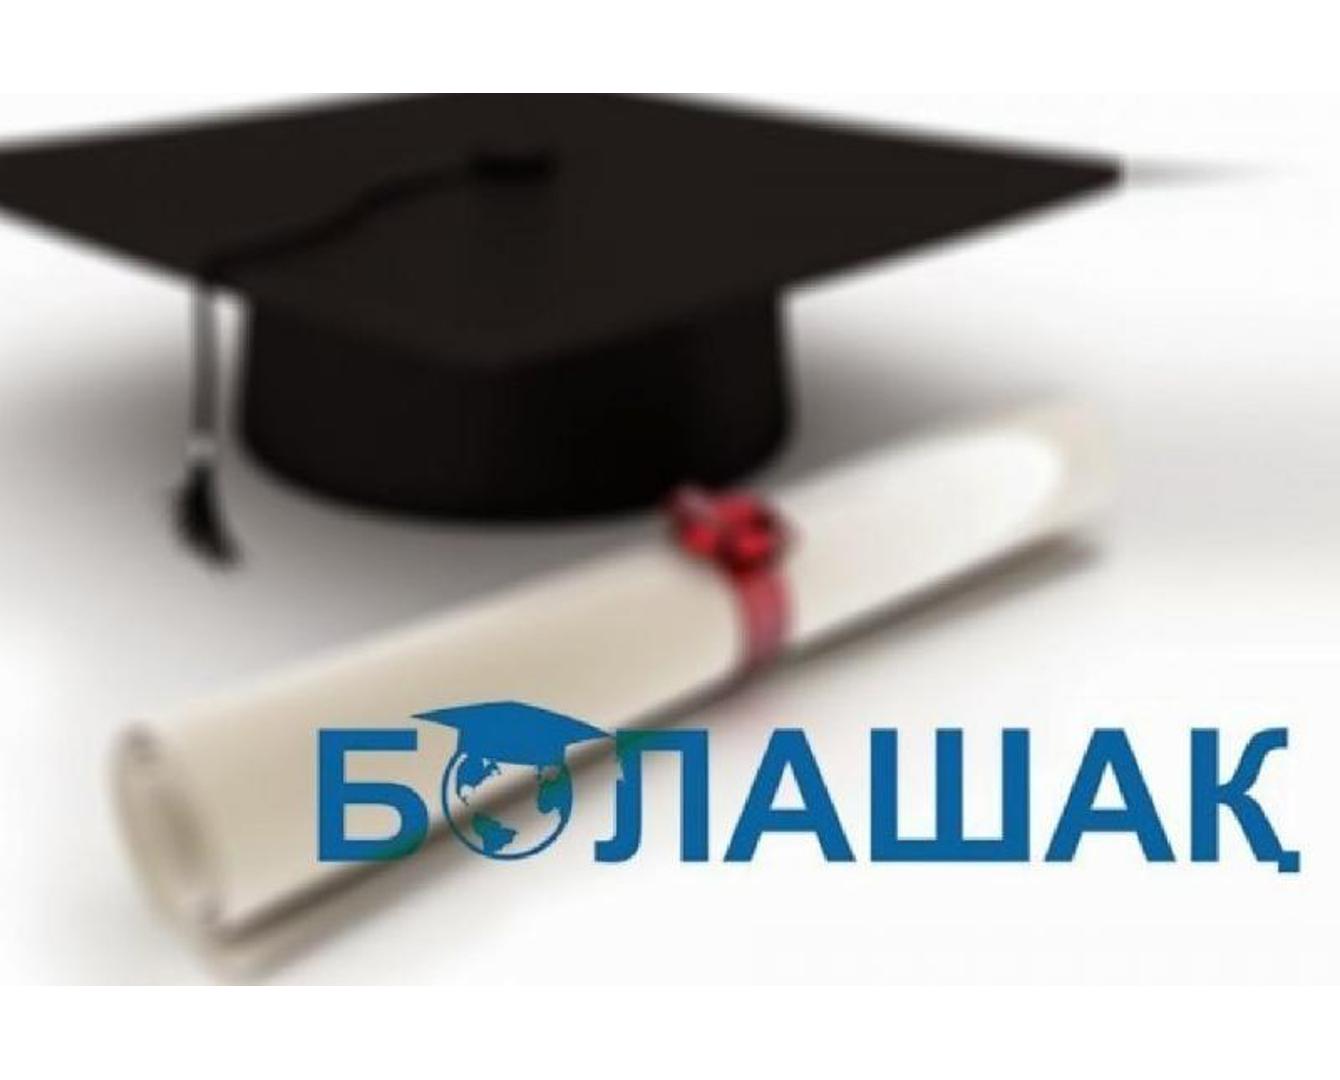 Bolashak Scholarship awarded to 71 applicants